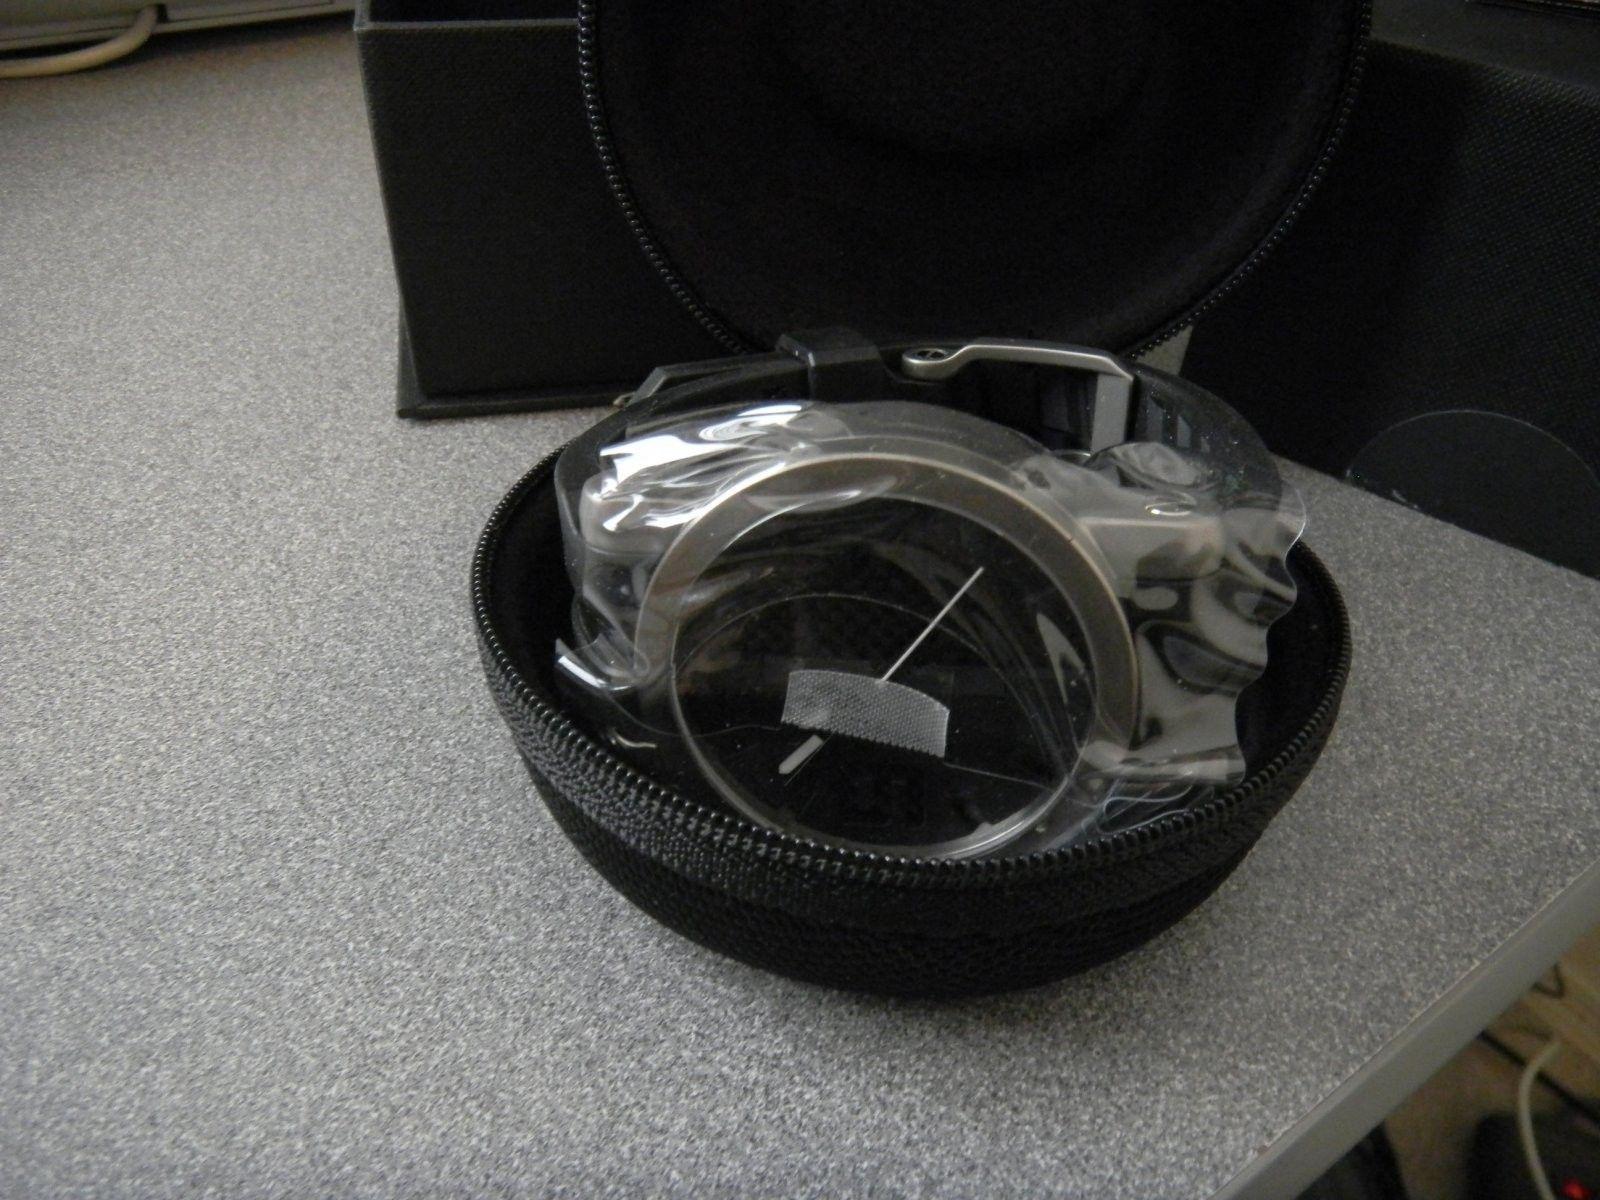 LNIB Gearbox TI Brushed /Black Carbon Dial - DSCN1926.JPG